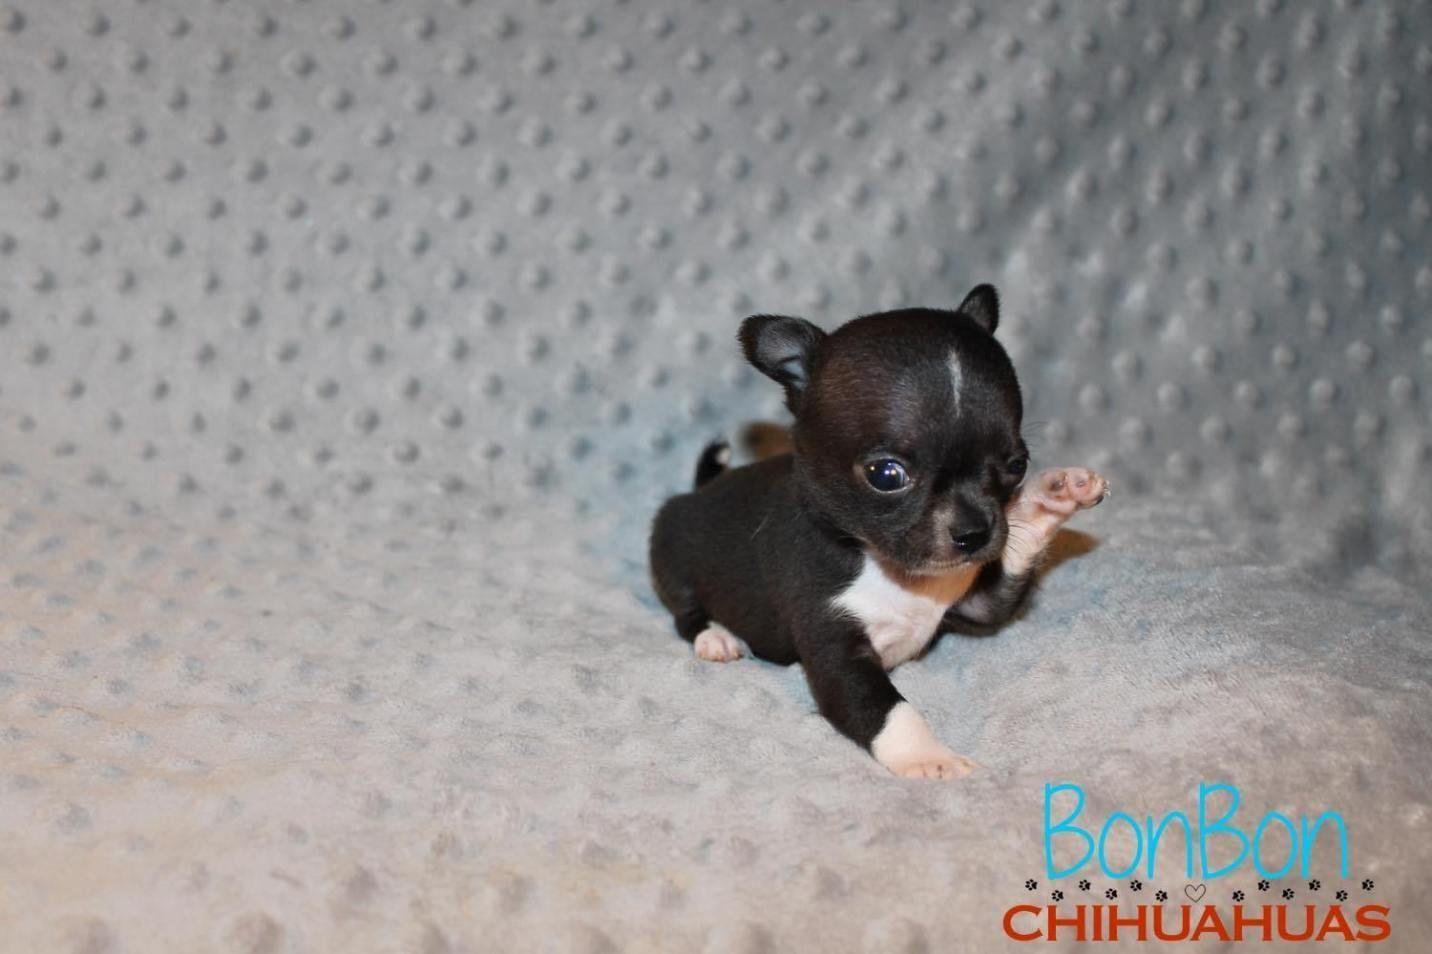 Chihuahua Puppies For Sale Bonbon Chihuahua Chihuahua Puppies